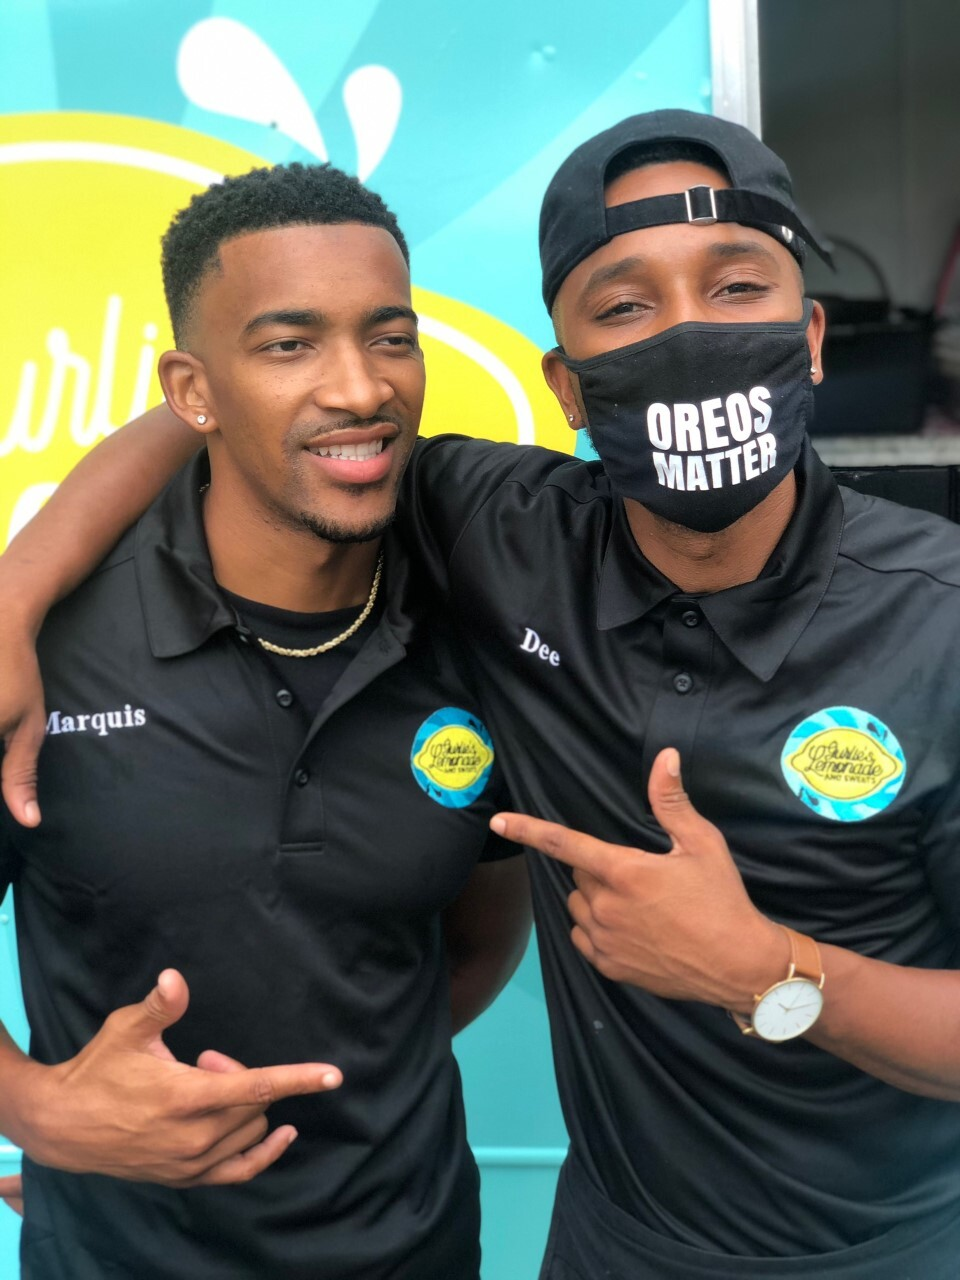 Demetrius Murray and Marquis Williams create slogan Oreos matter